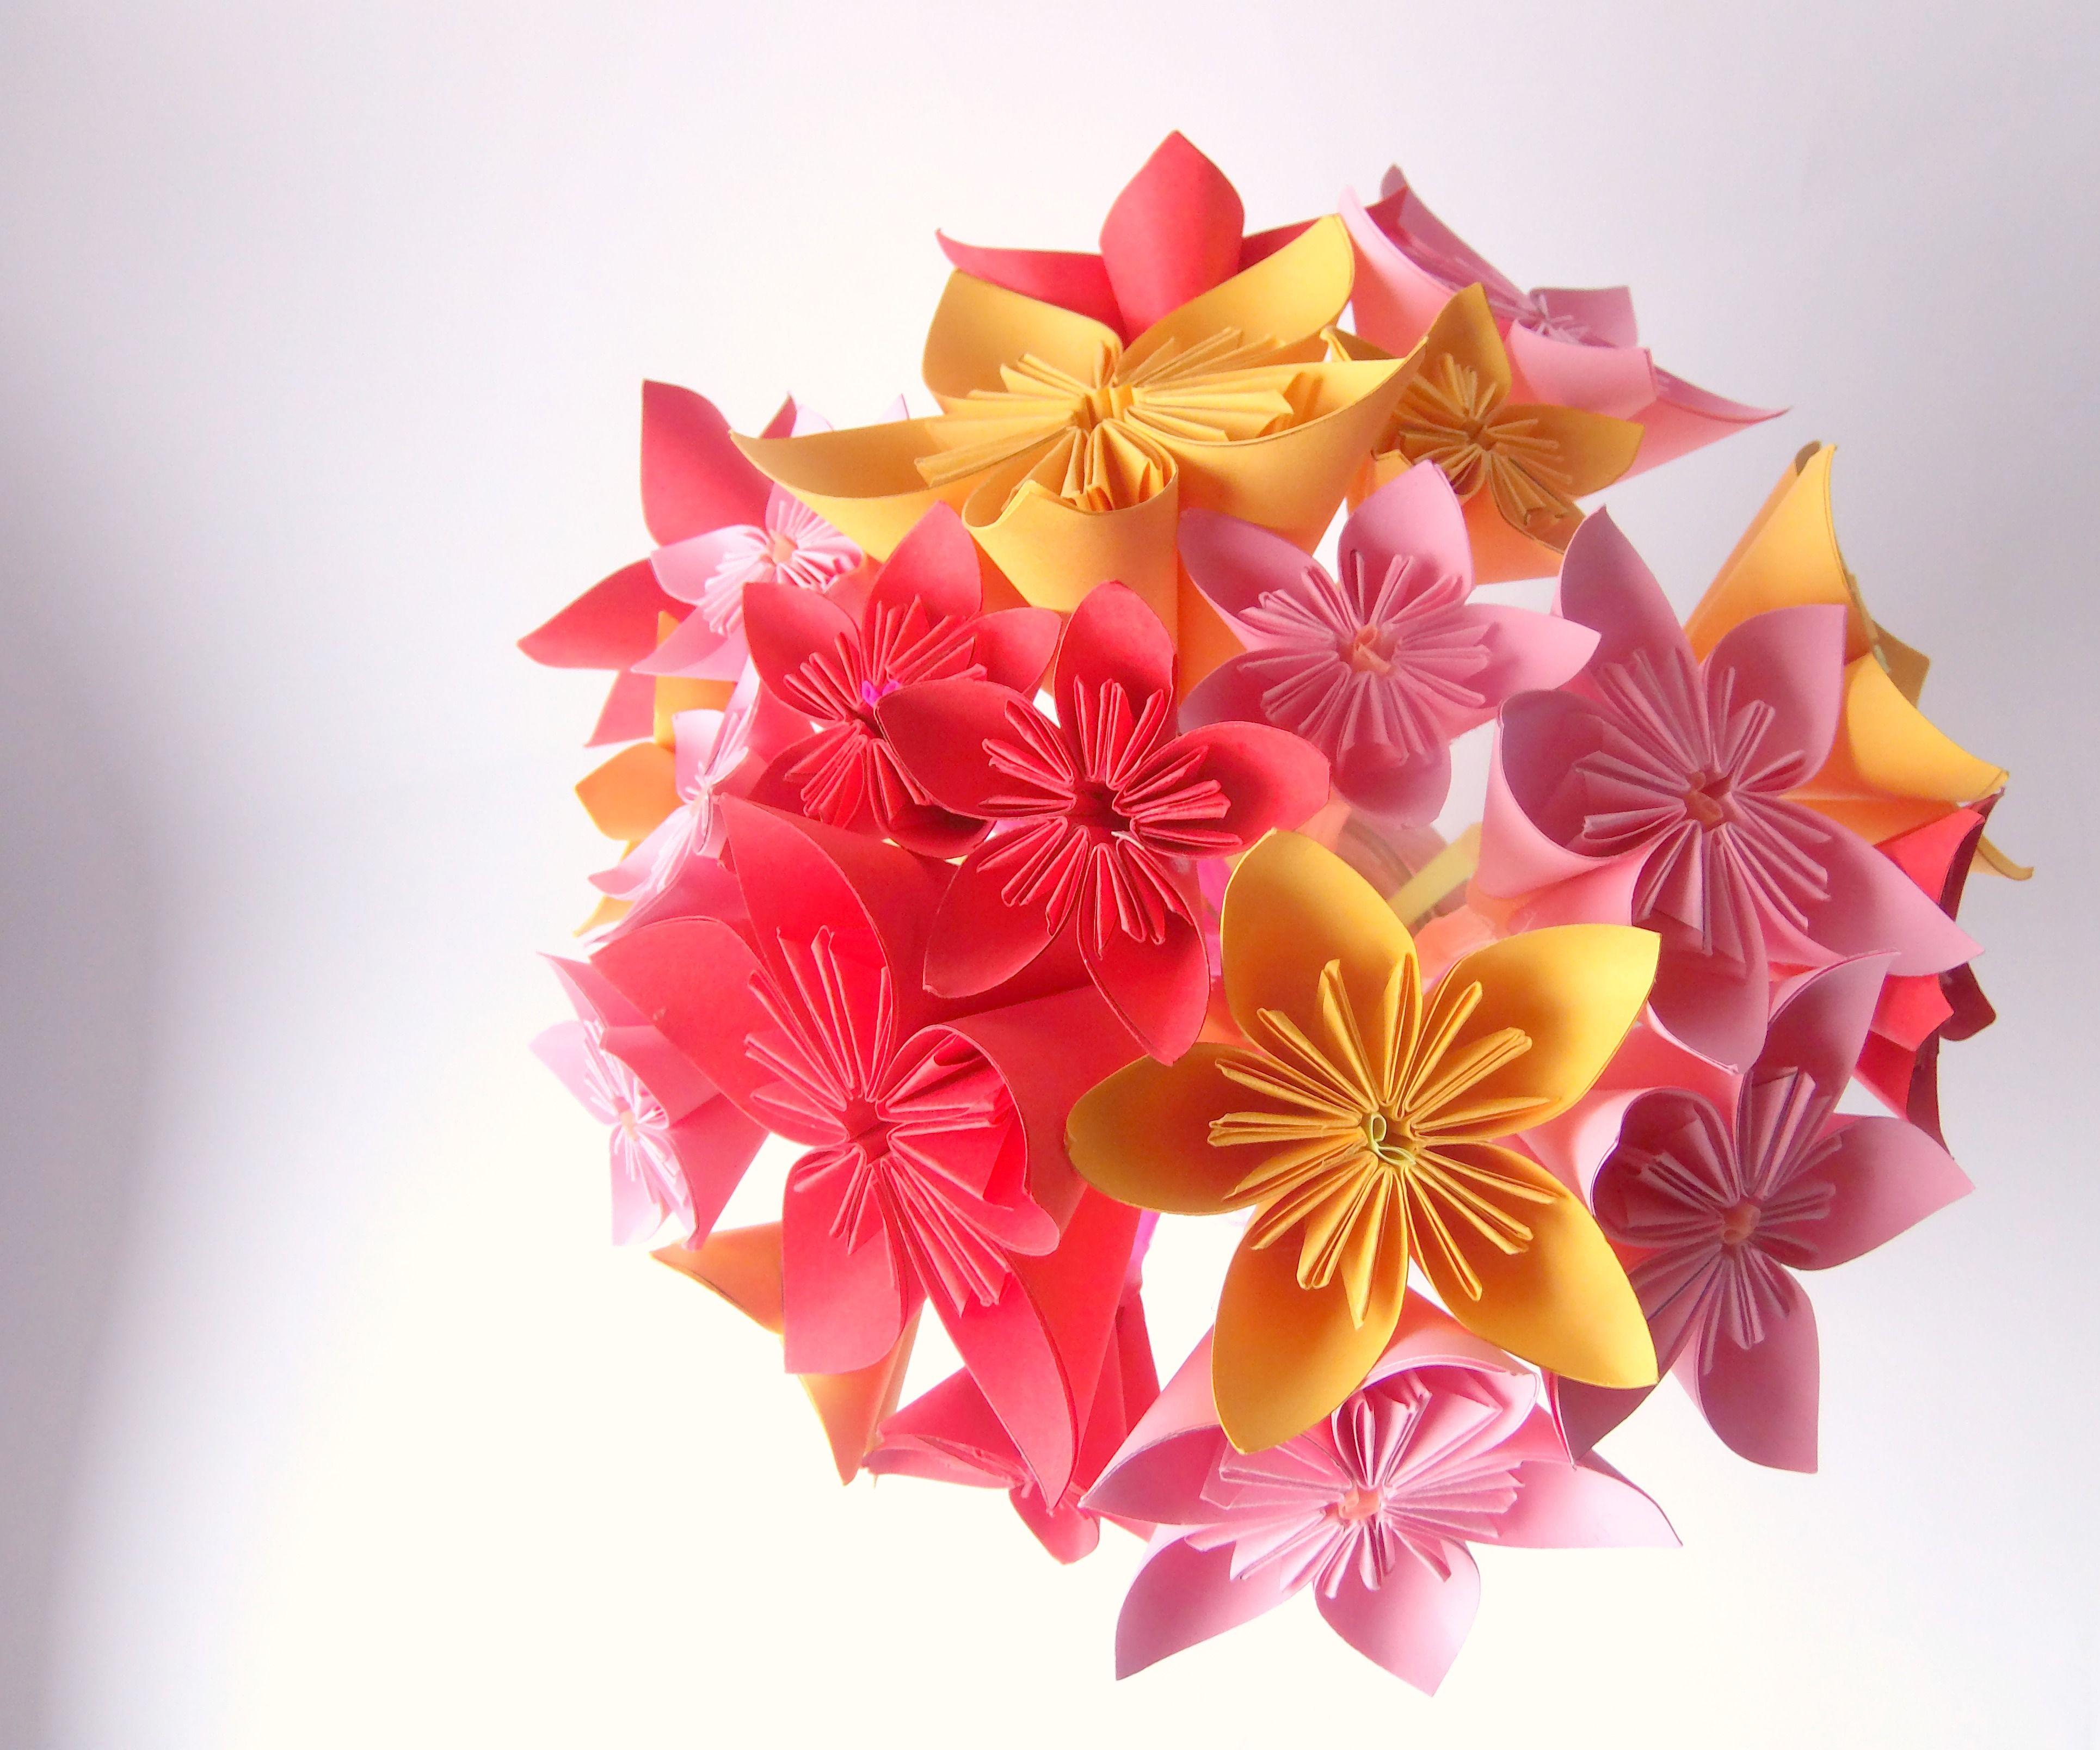 Amazon.com: Origami Flowers: Fold Beautiful Paper Flower Bouquets ... | 3216x3859